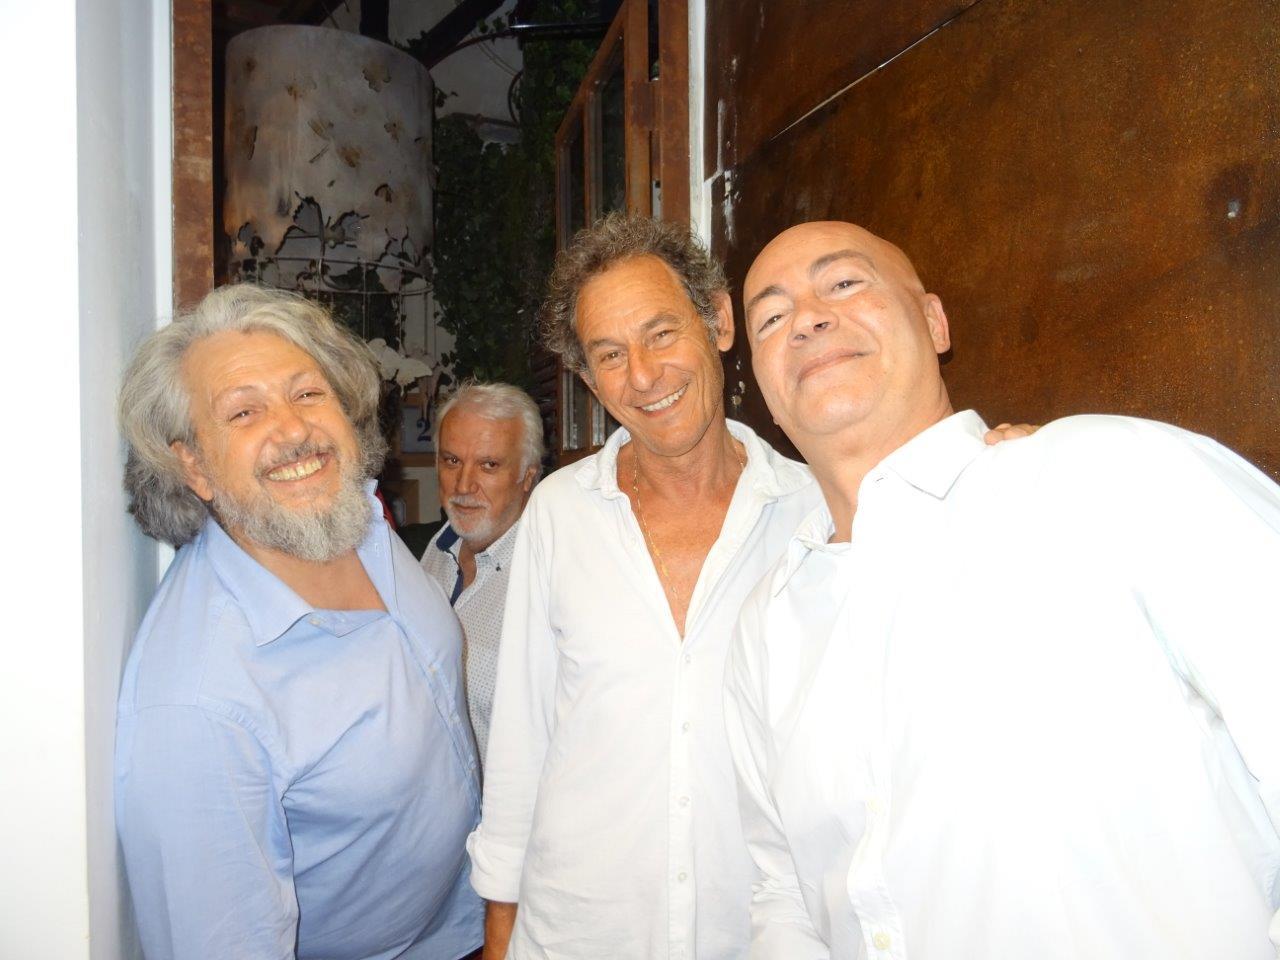 Massimo Ardizzone, Massimo Sgroi e Alfonso Catasino